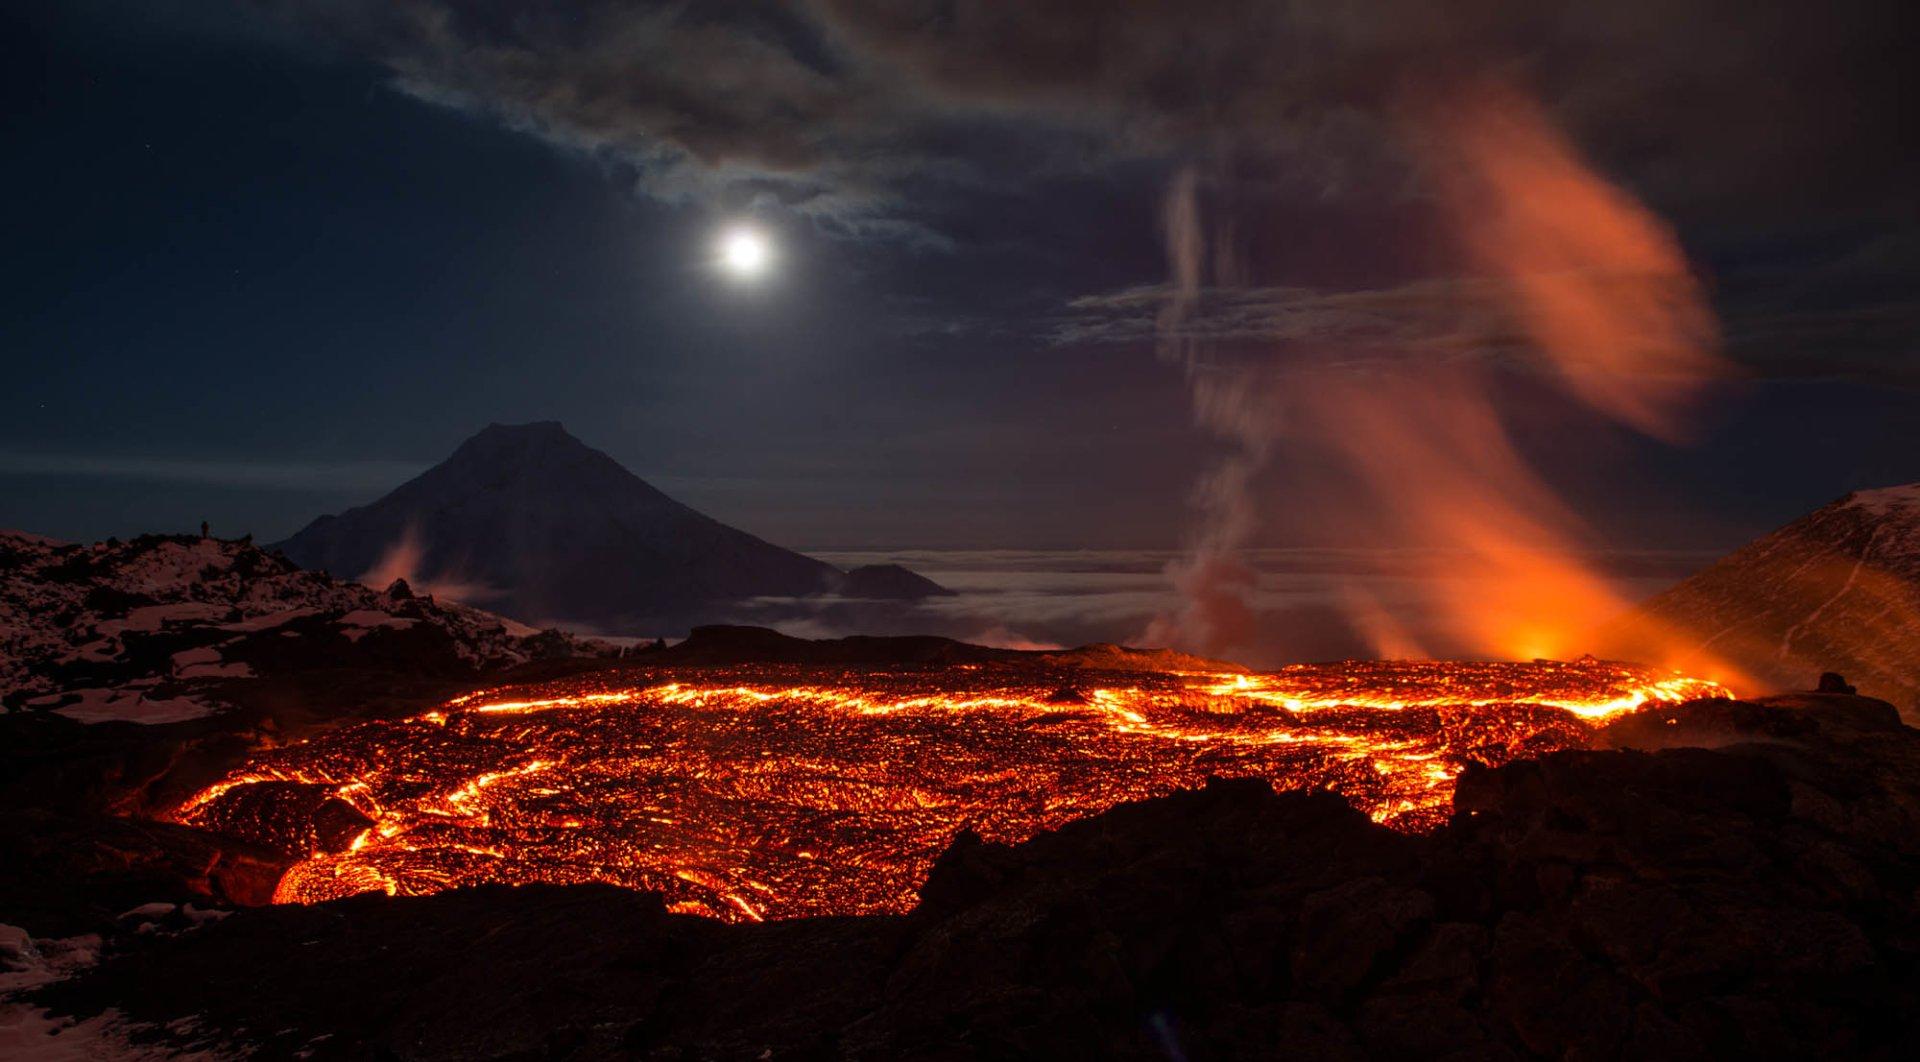 Volcano Wallpapers Hd: Fondos De Pantalla De Volcanes, Wallpapers HD